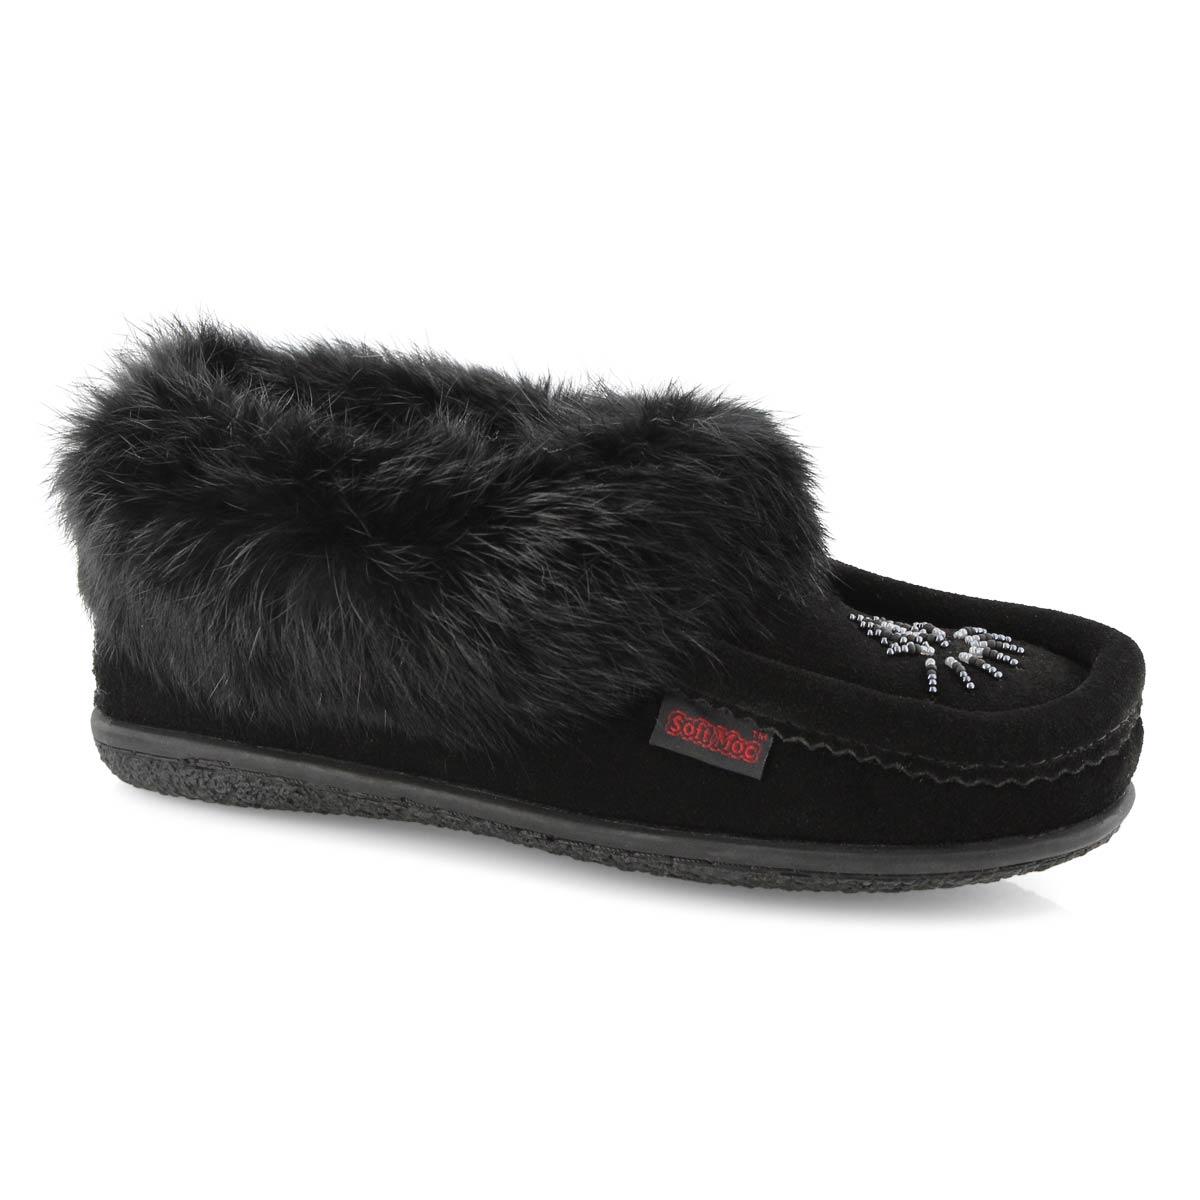 Lds Cute 4 black rabbit fur moccasin